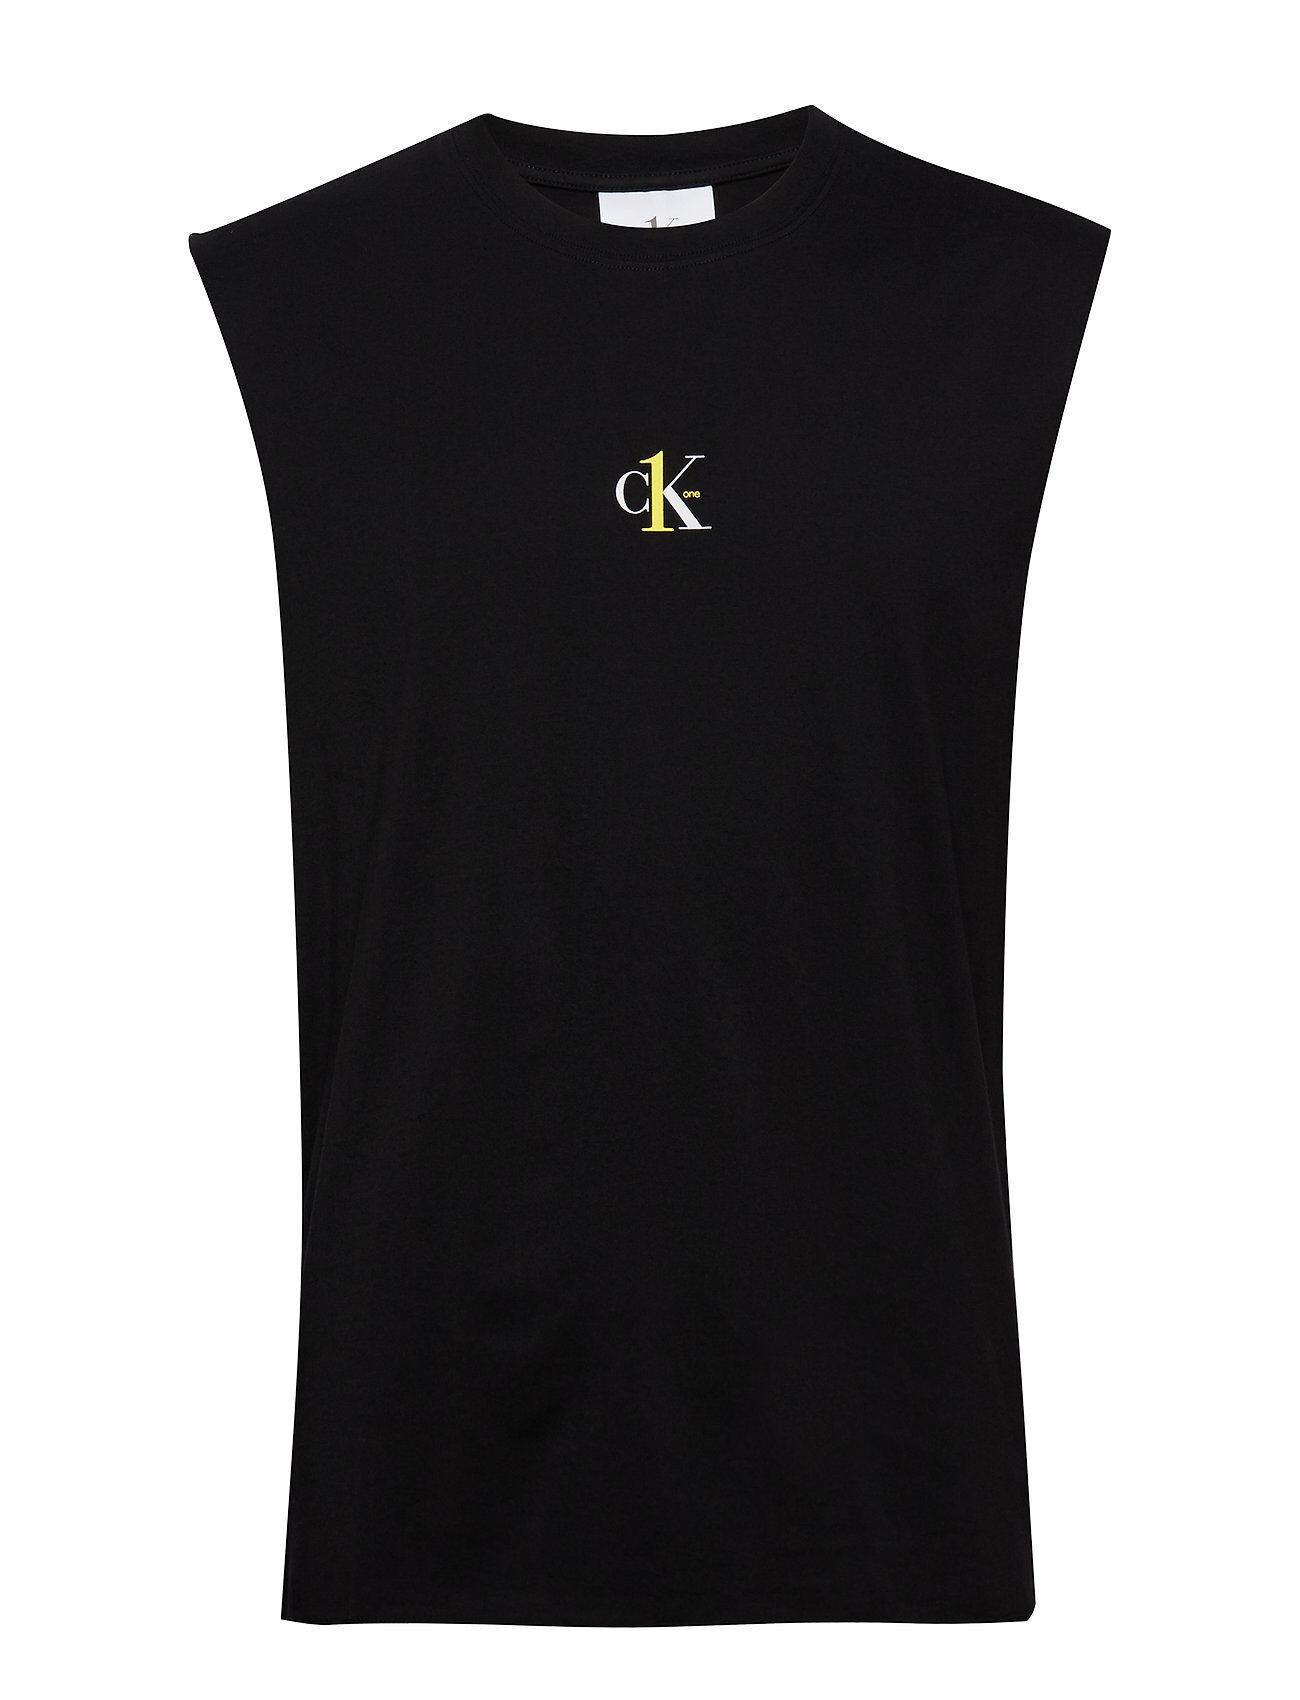 Image of Calvin Small Logo Regular Sls Tee T-shirts Sleeveless Musta Calvin Klein Jeans